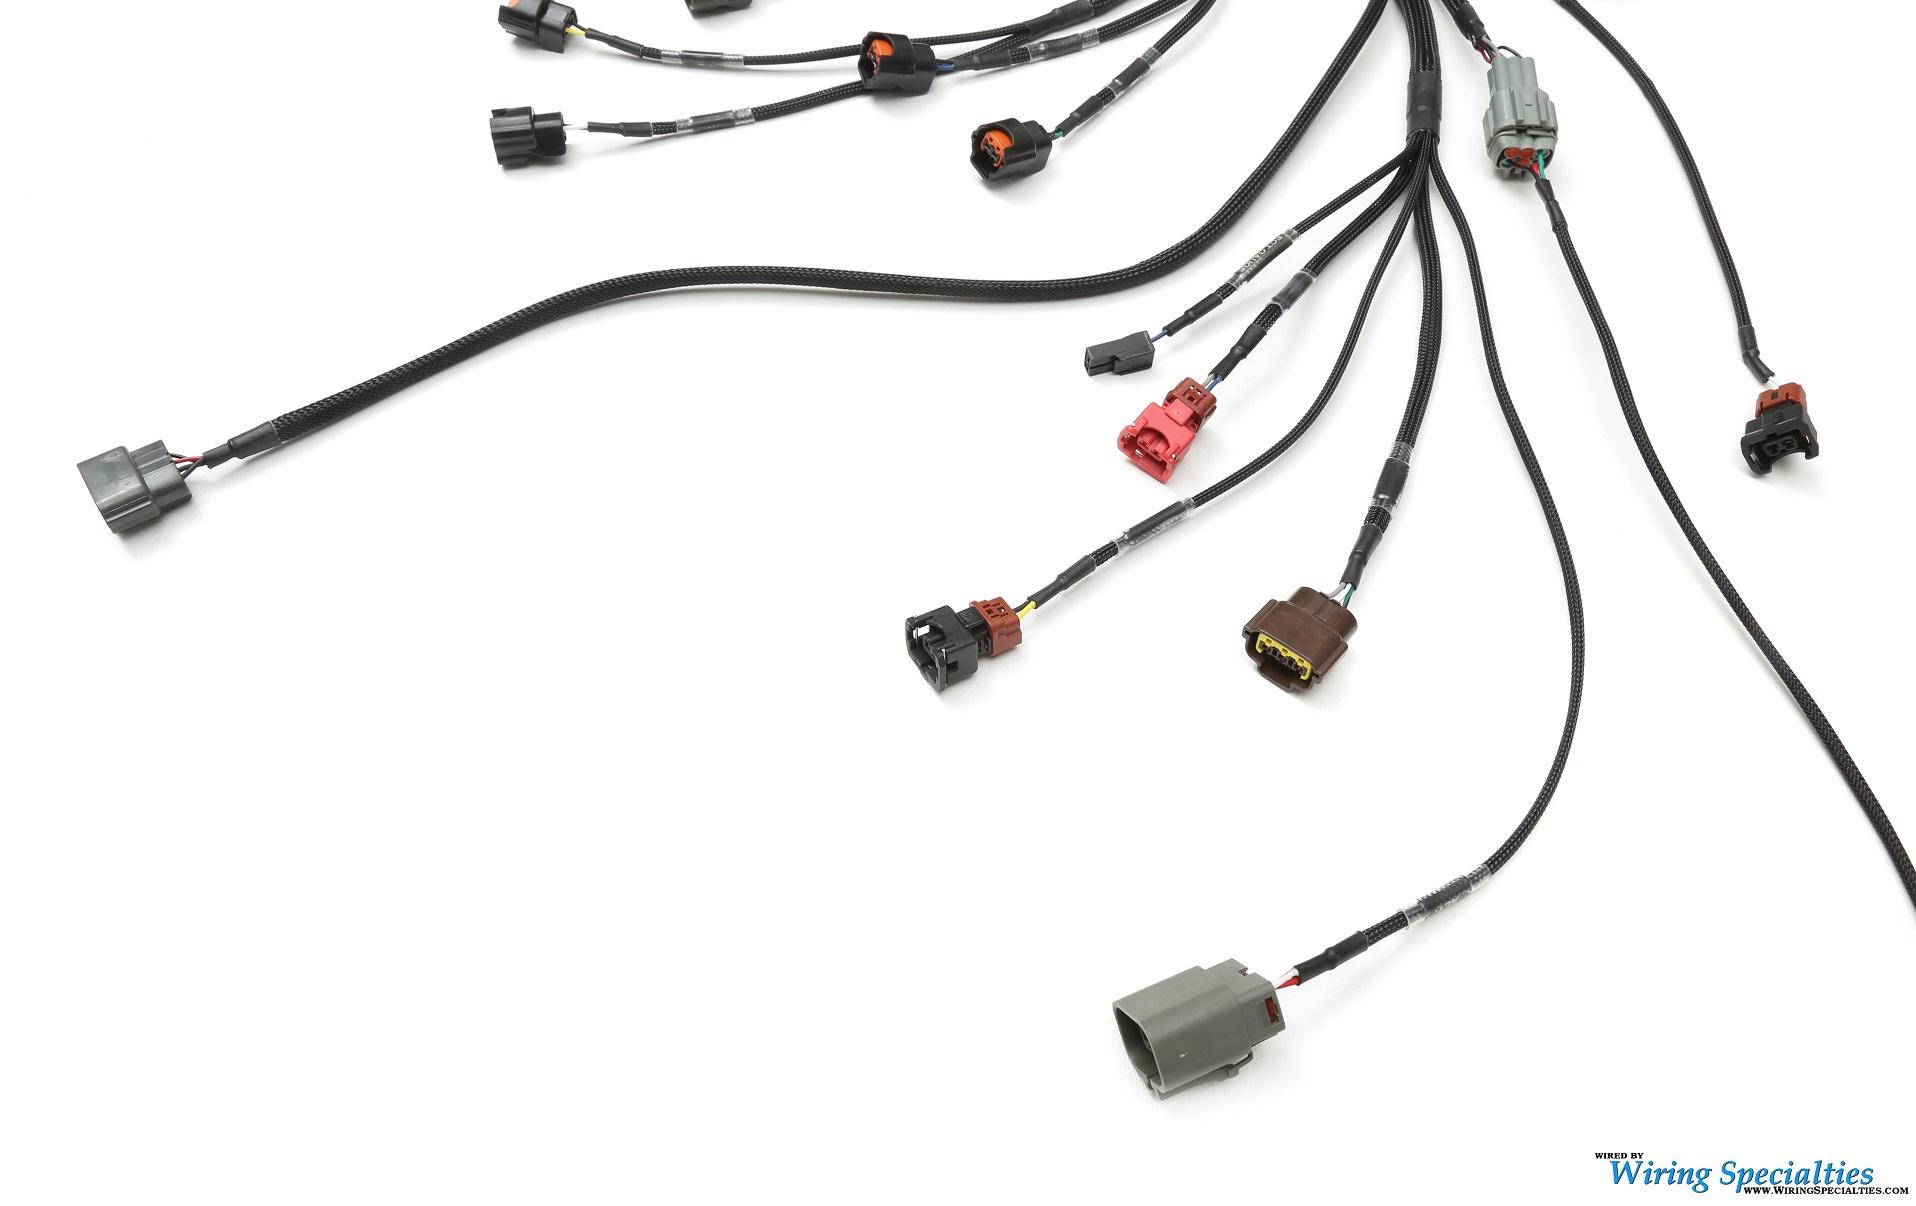 s13 240sx sr20det (s14) swap wiring harness   wiring specialties  wiring specialties